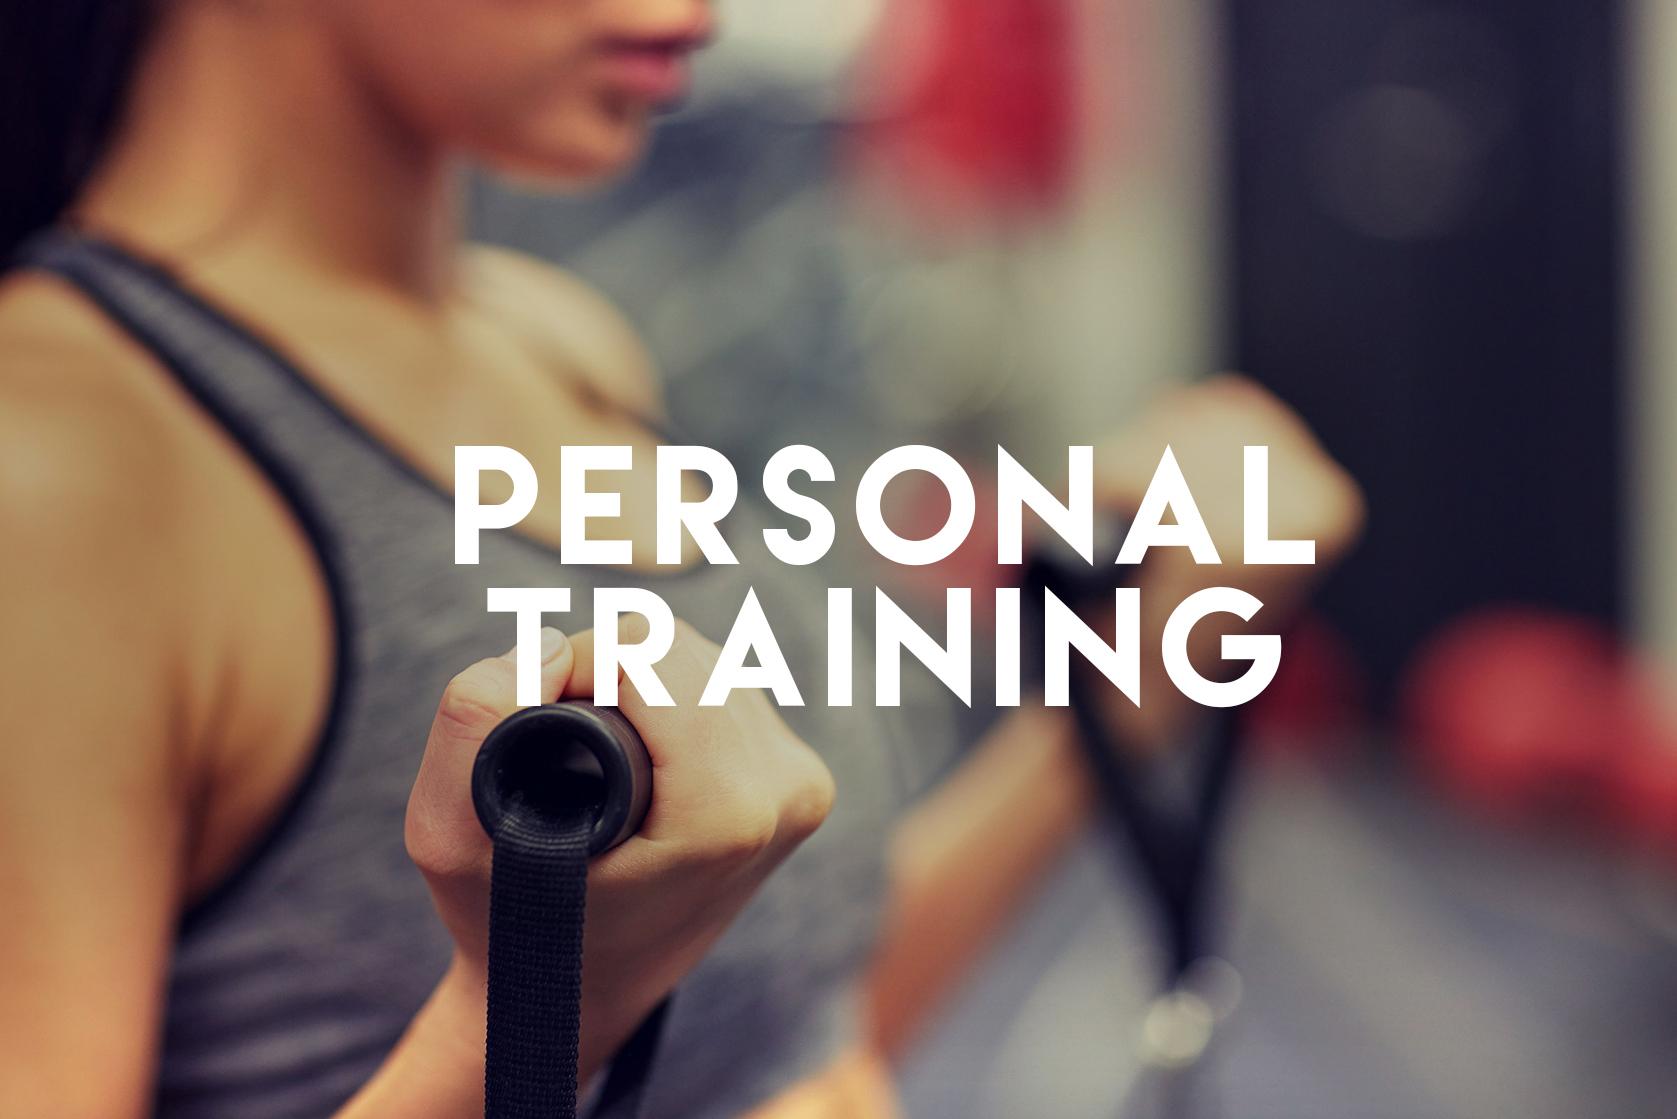 personal training.jpg